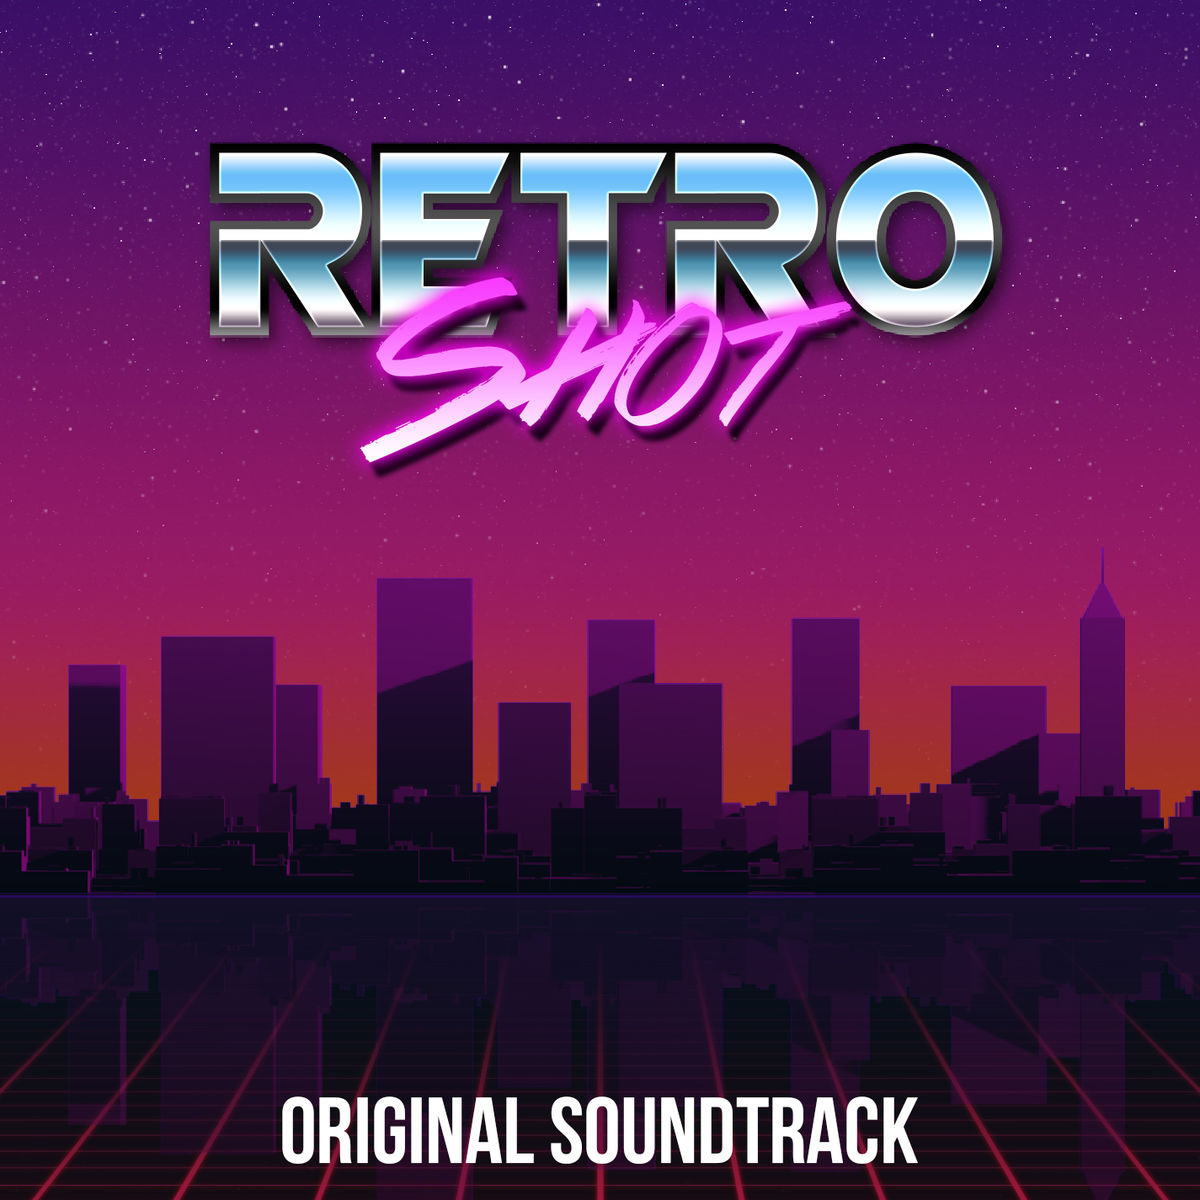 Скриншоты soundtrack database